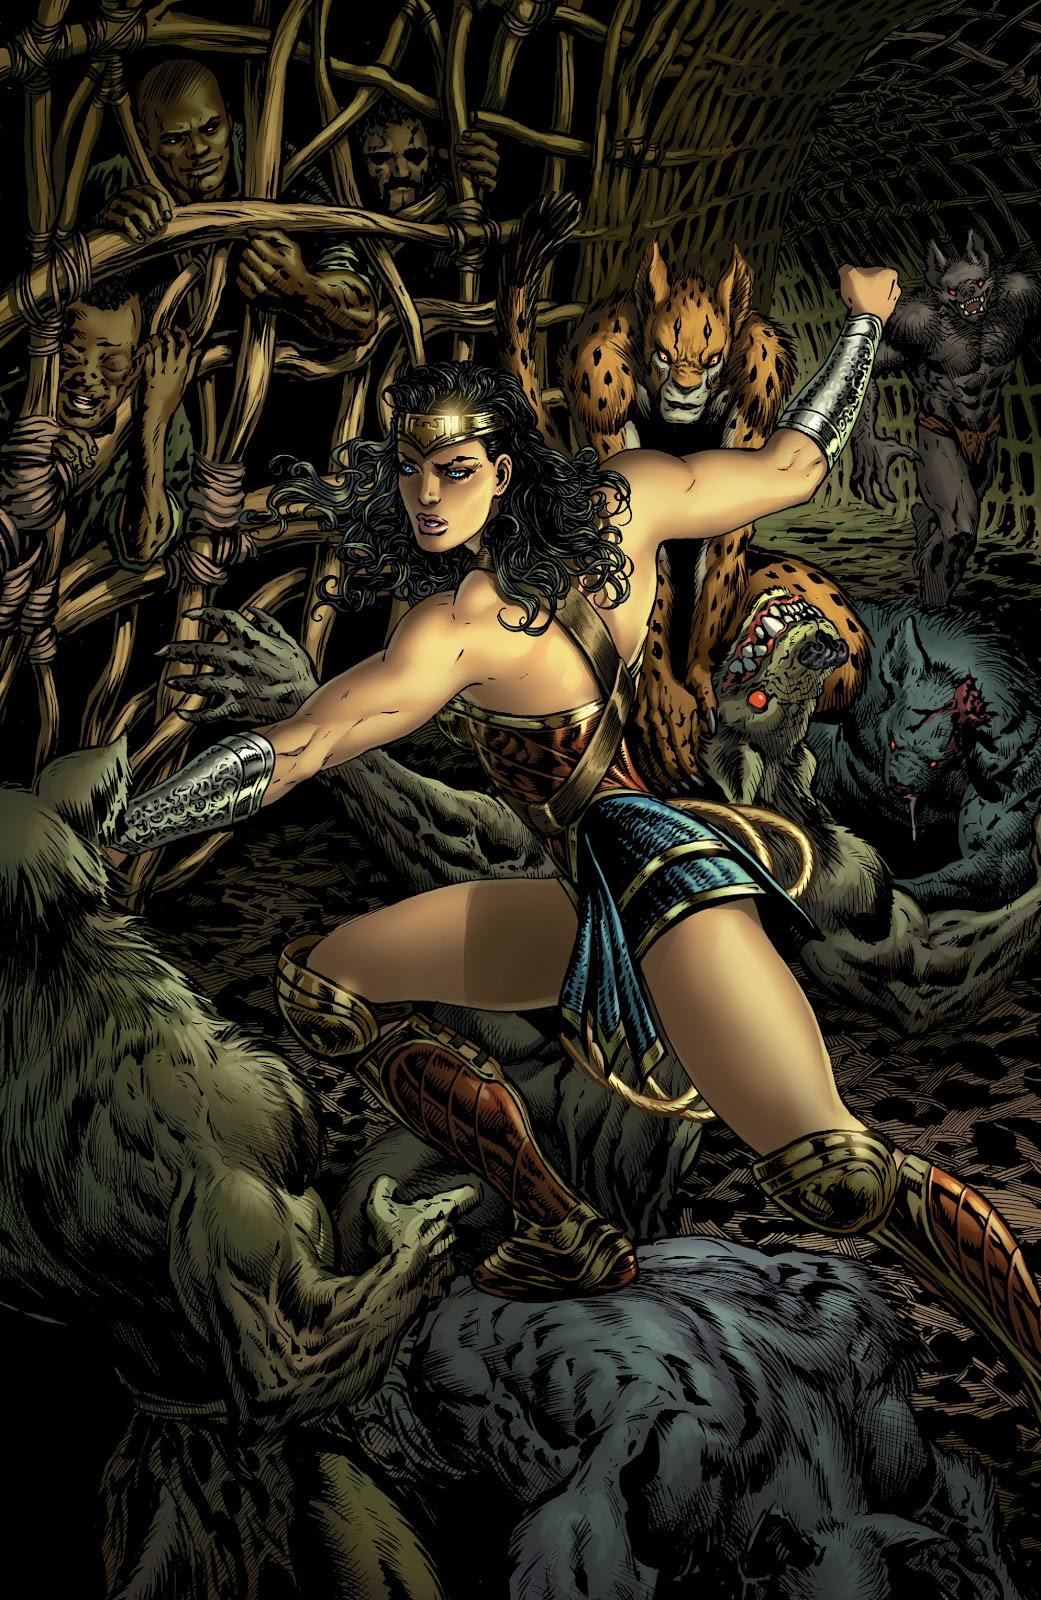 Wonder Woman Vol. 5 #5